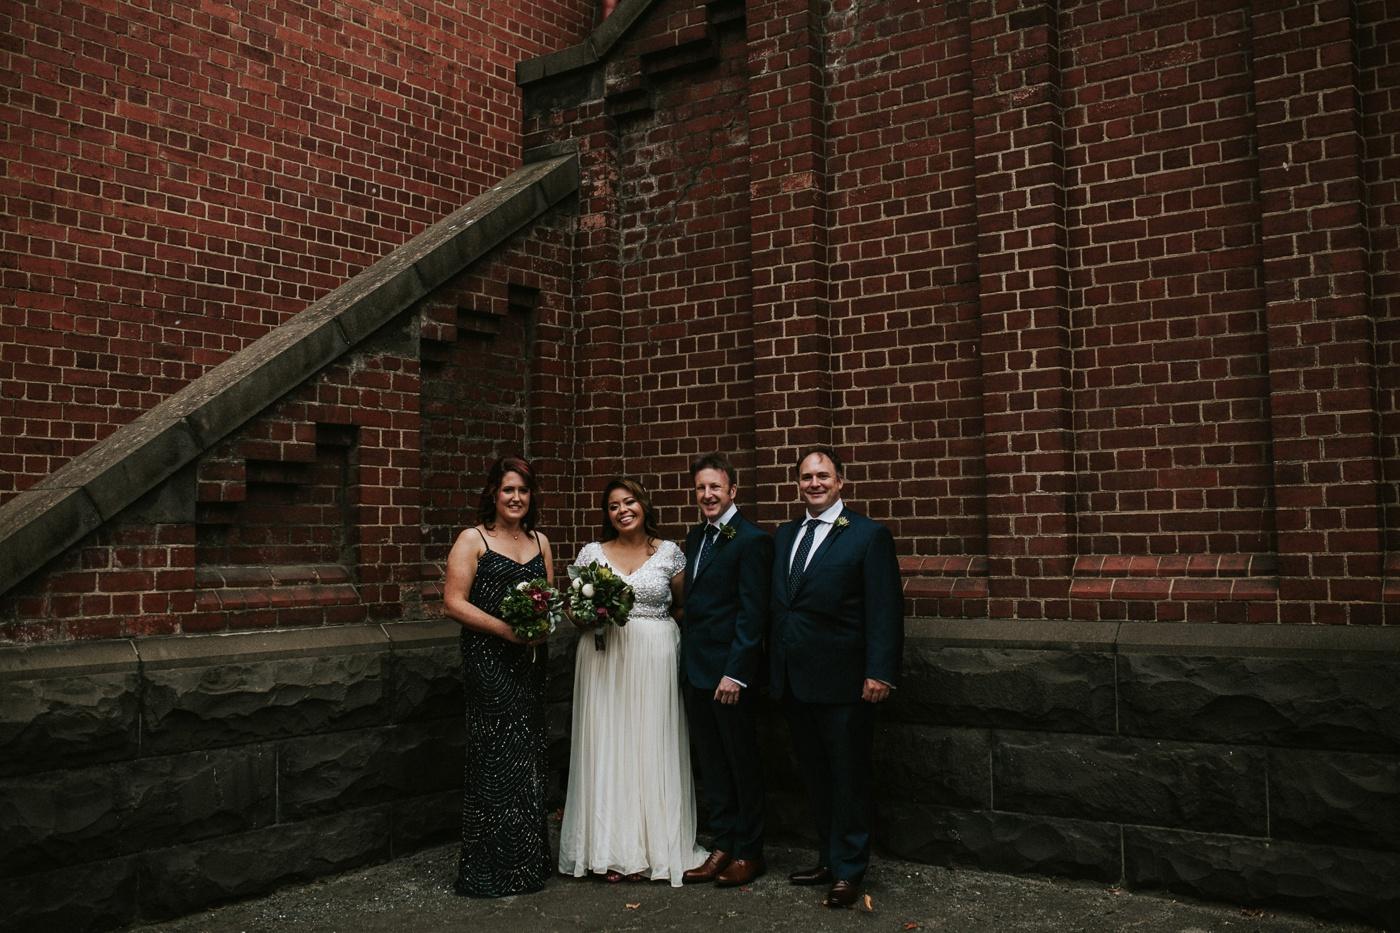 anitadaniel_melbourne-scienceworks-relaxed-fun-geek-wedding_melbourne-candid-wedding-photography_9